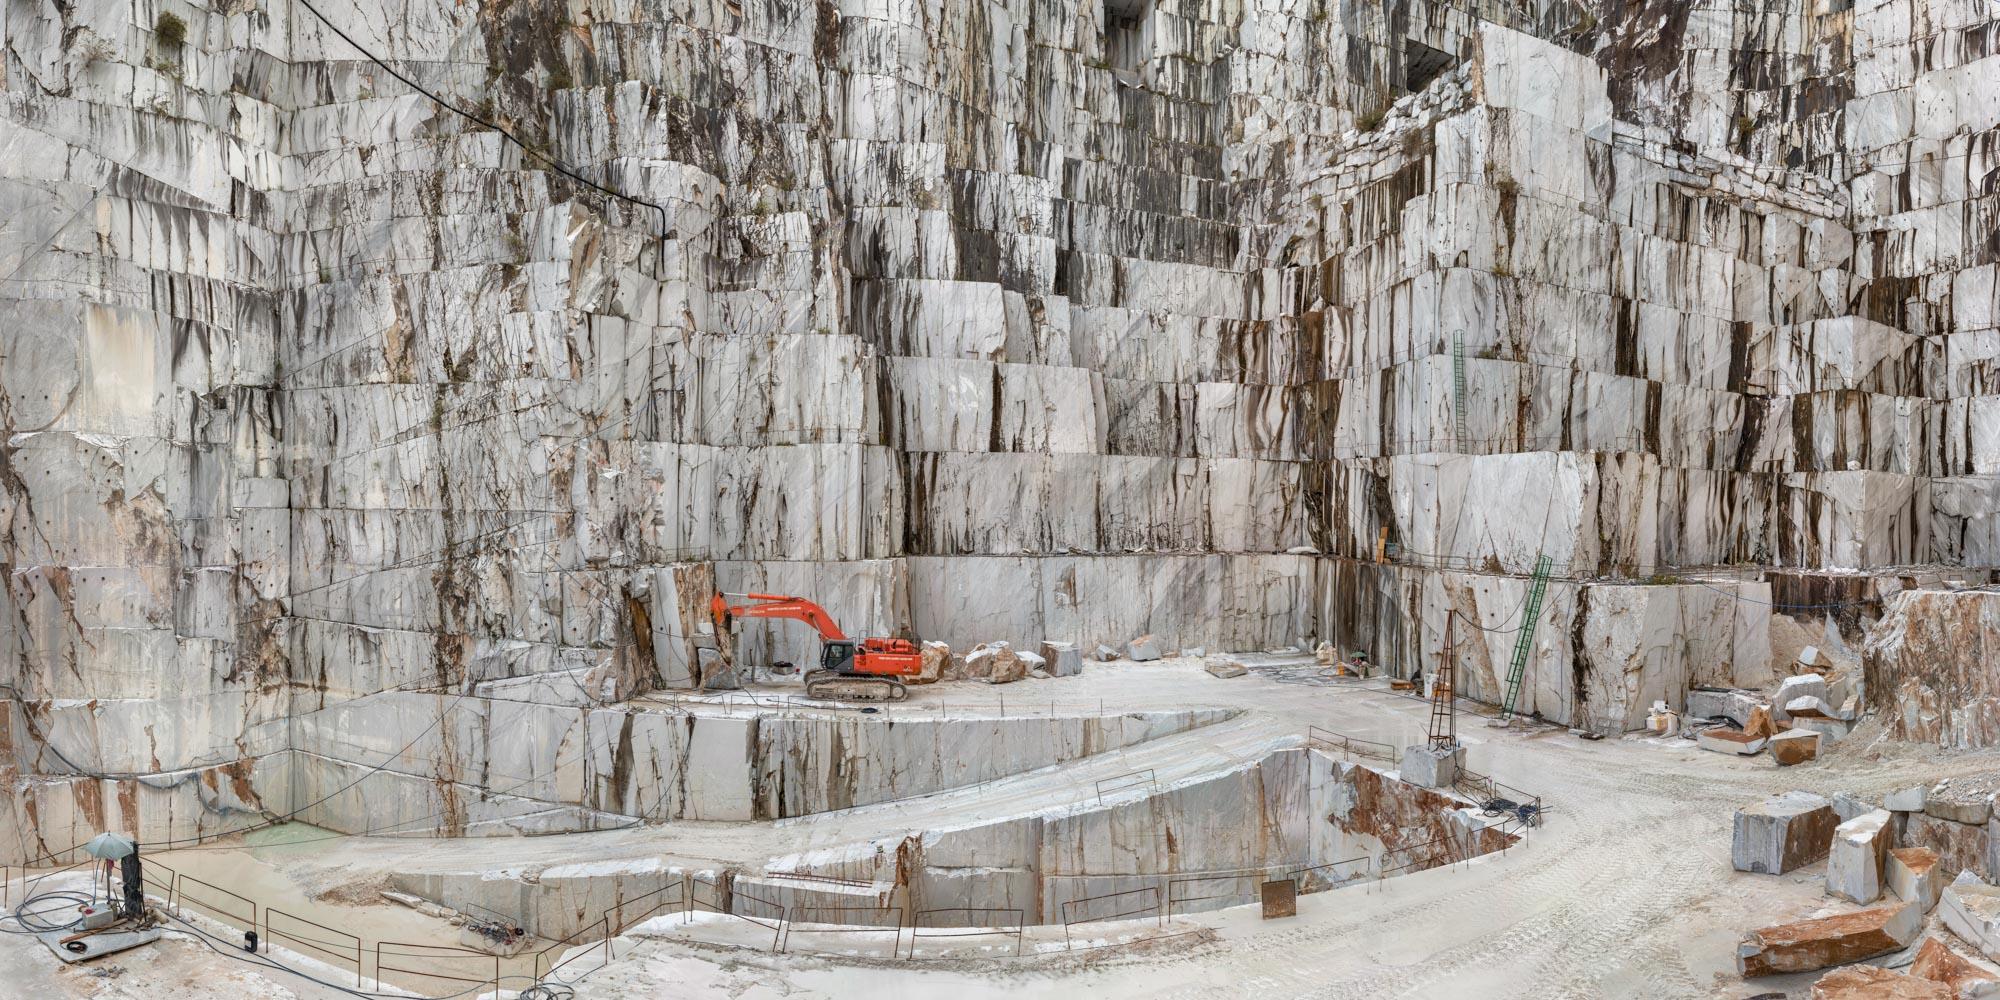 Carrara Marble Quarries, Cava di Canalgrande #2, Carrara, Italy 2016 © Edward Burtynsky, courtesy Flowers Gallery, London / Howard Greenberg and Bryce Wolkowitz Galleries, New York